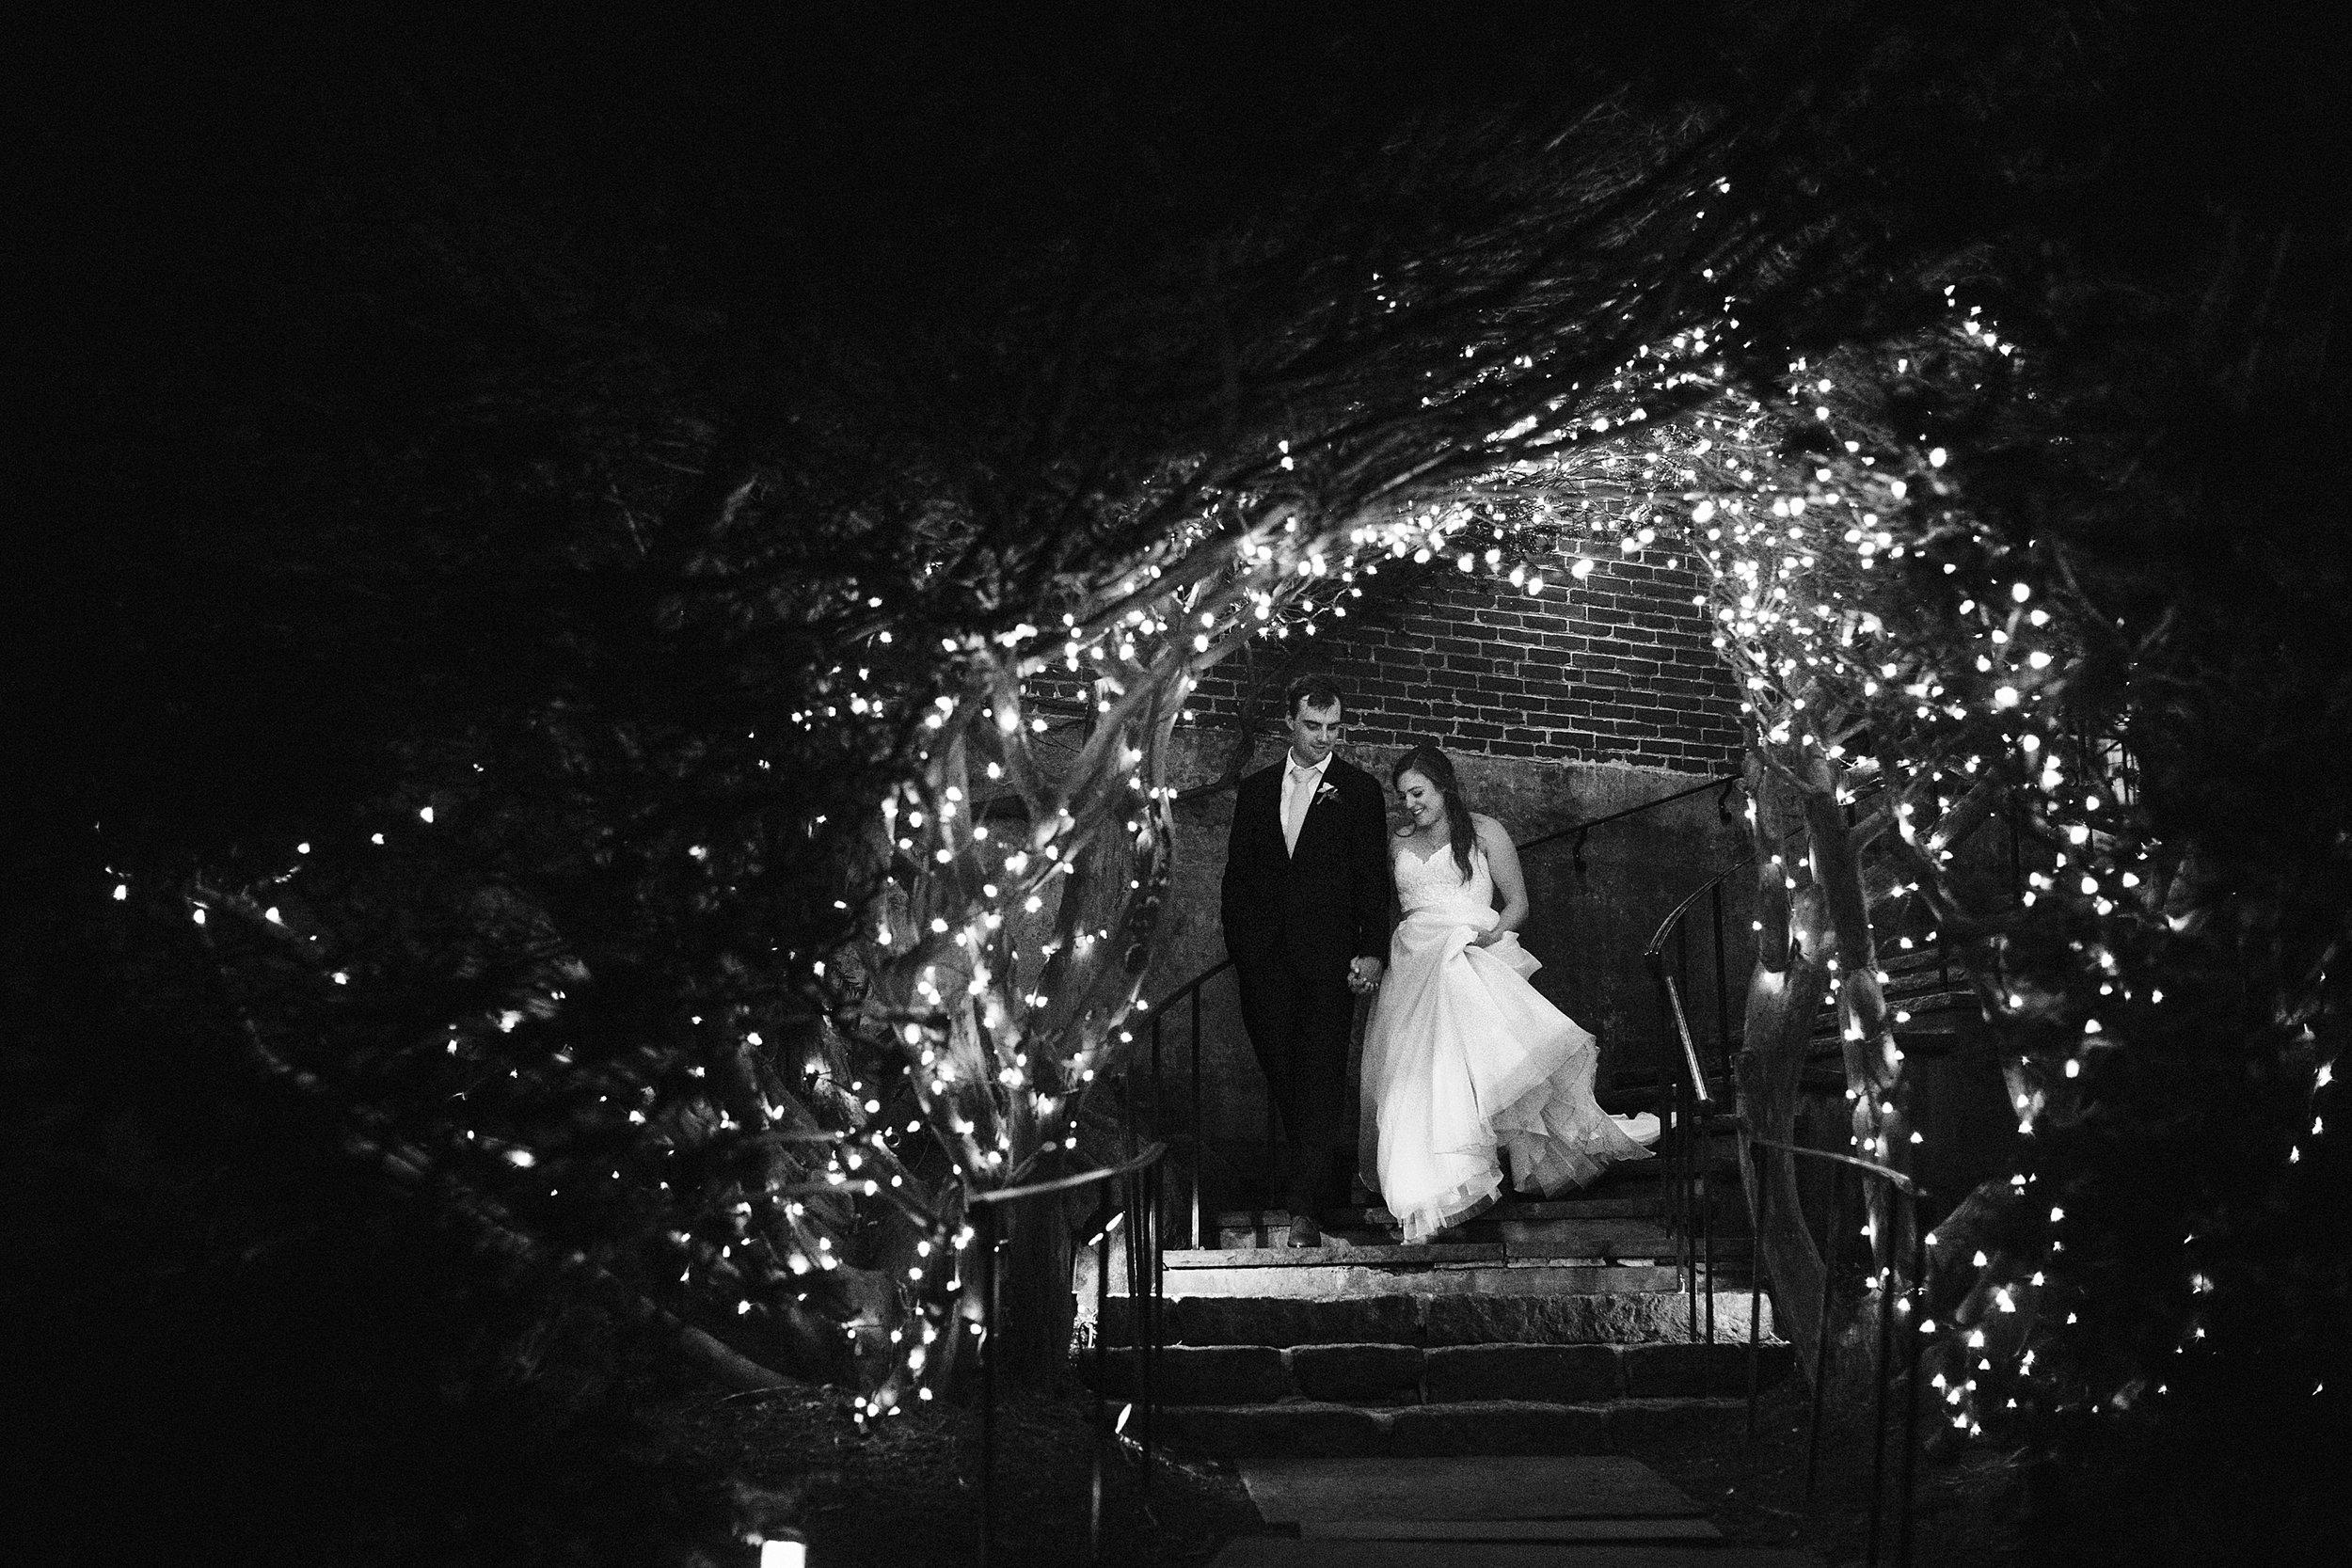 048 los angeles wedding photographer todd danforth photography boston.jpg